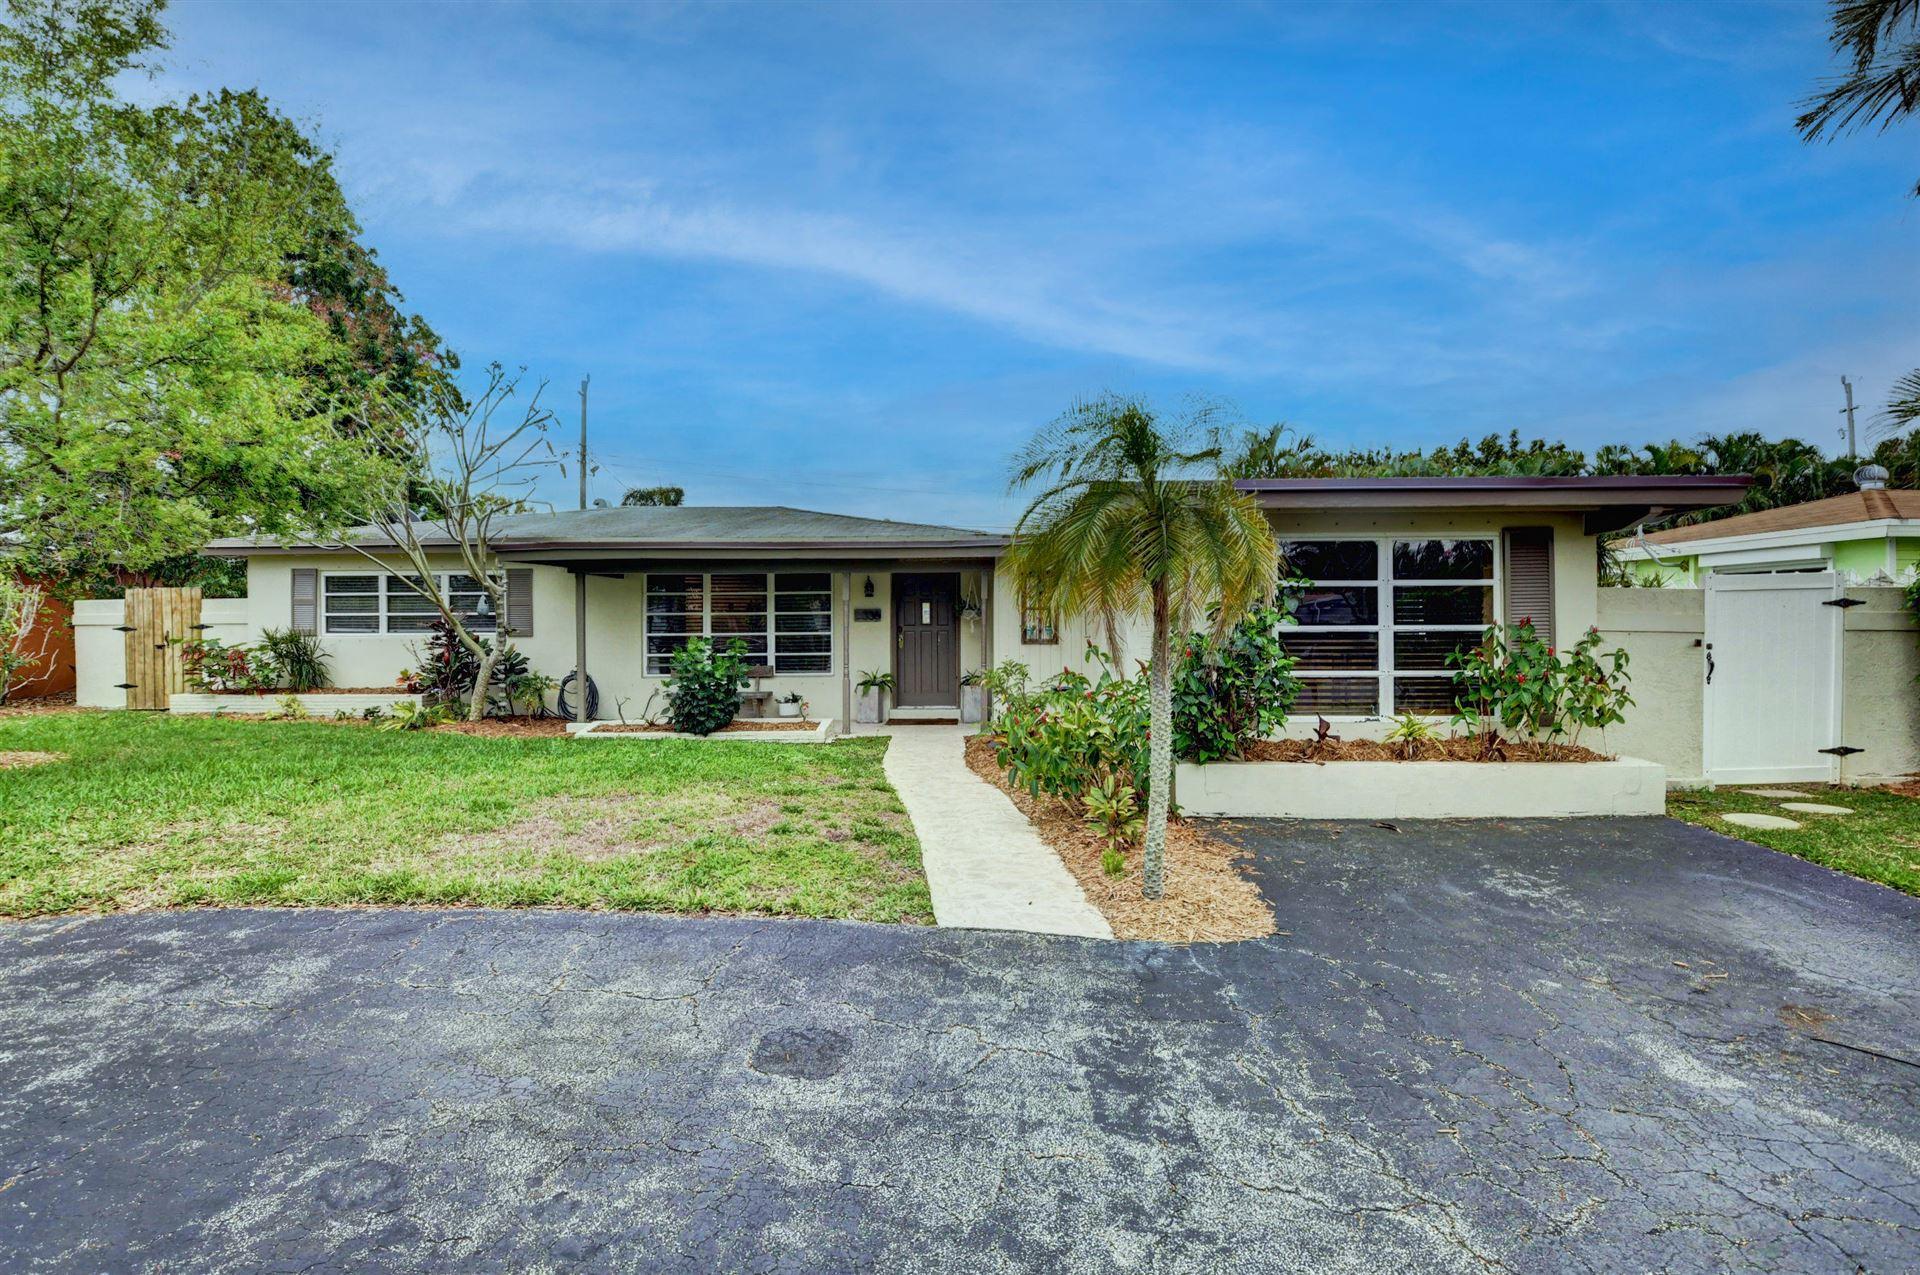 Photo of 336 NE 28th Terrace, Boca Raton, FL 33431 (MLS # RX-10697005)